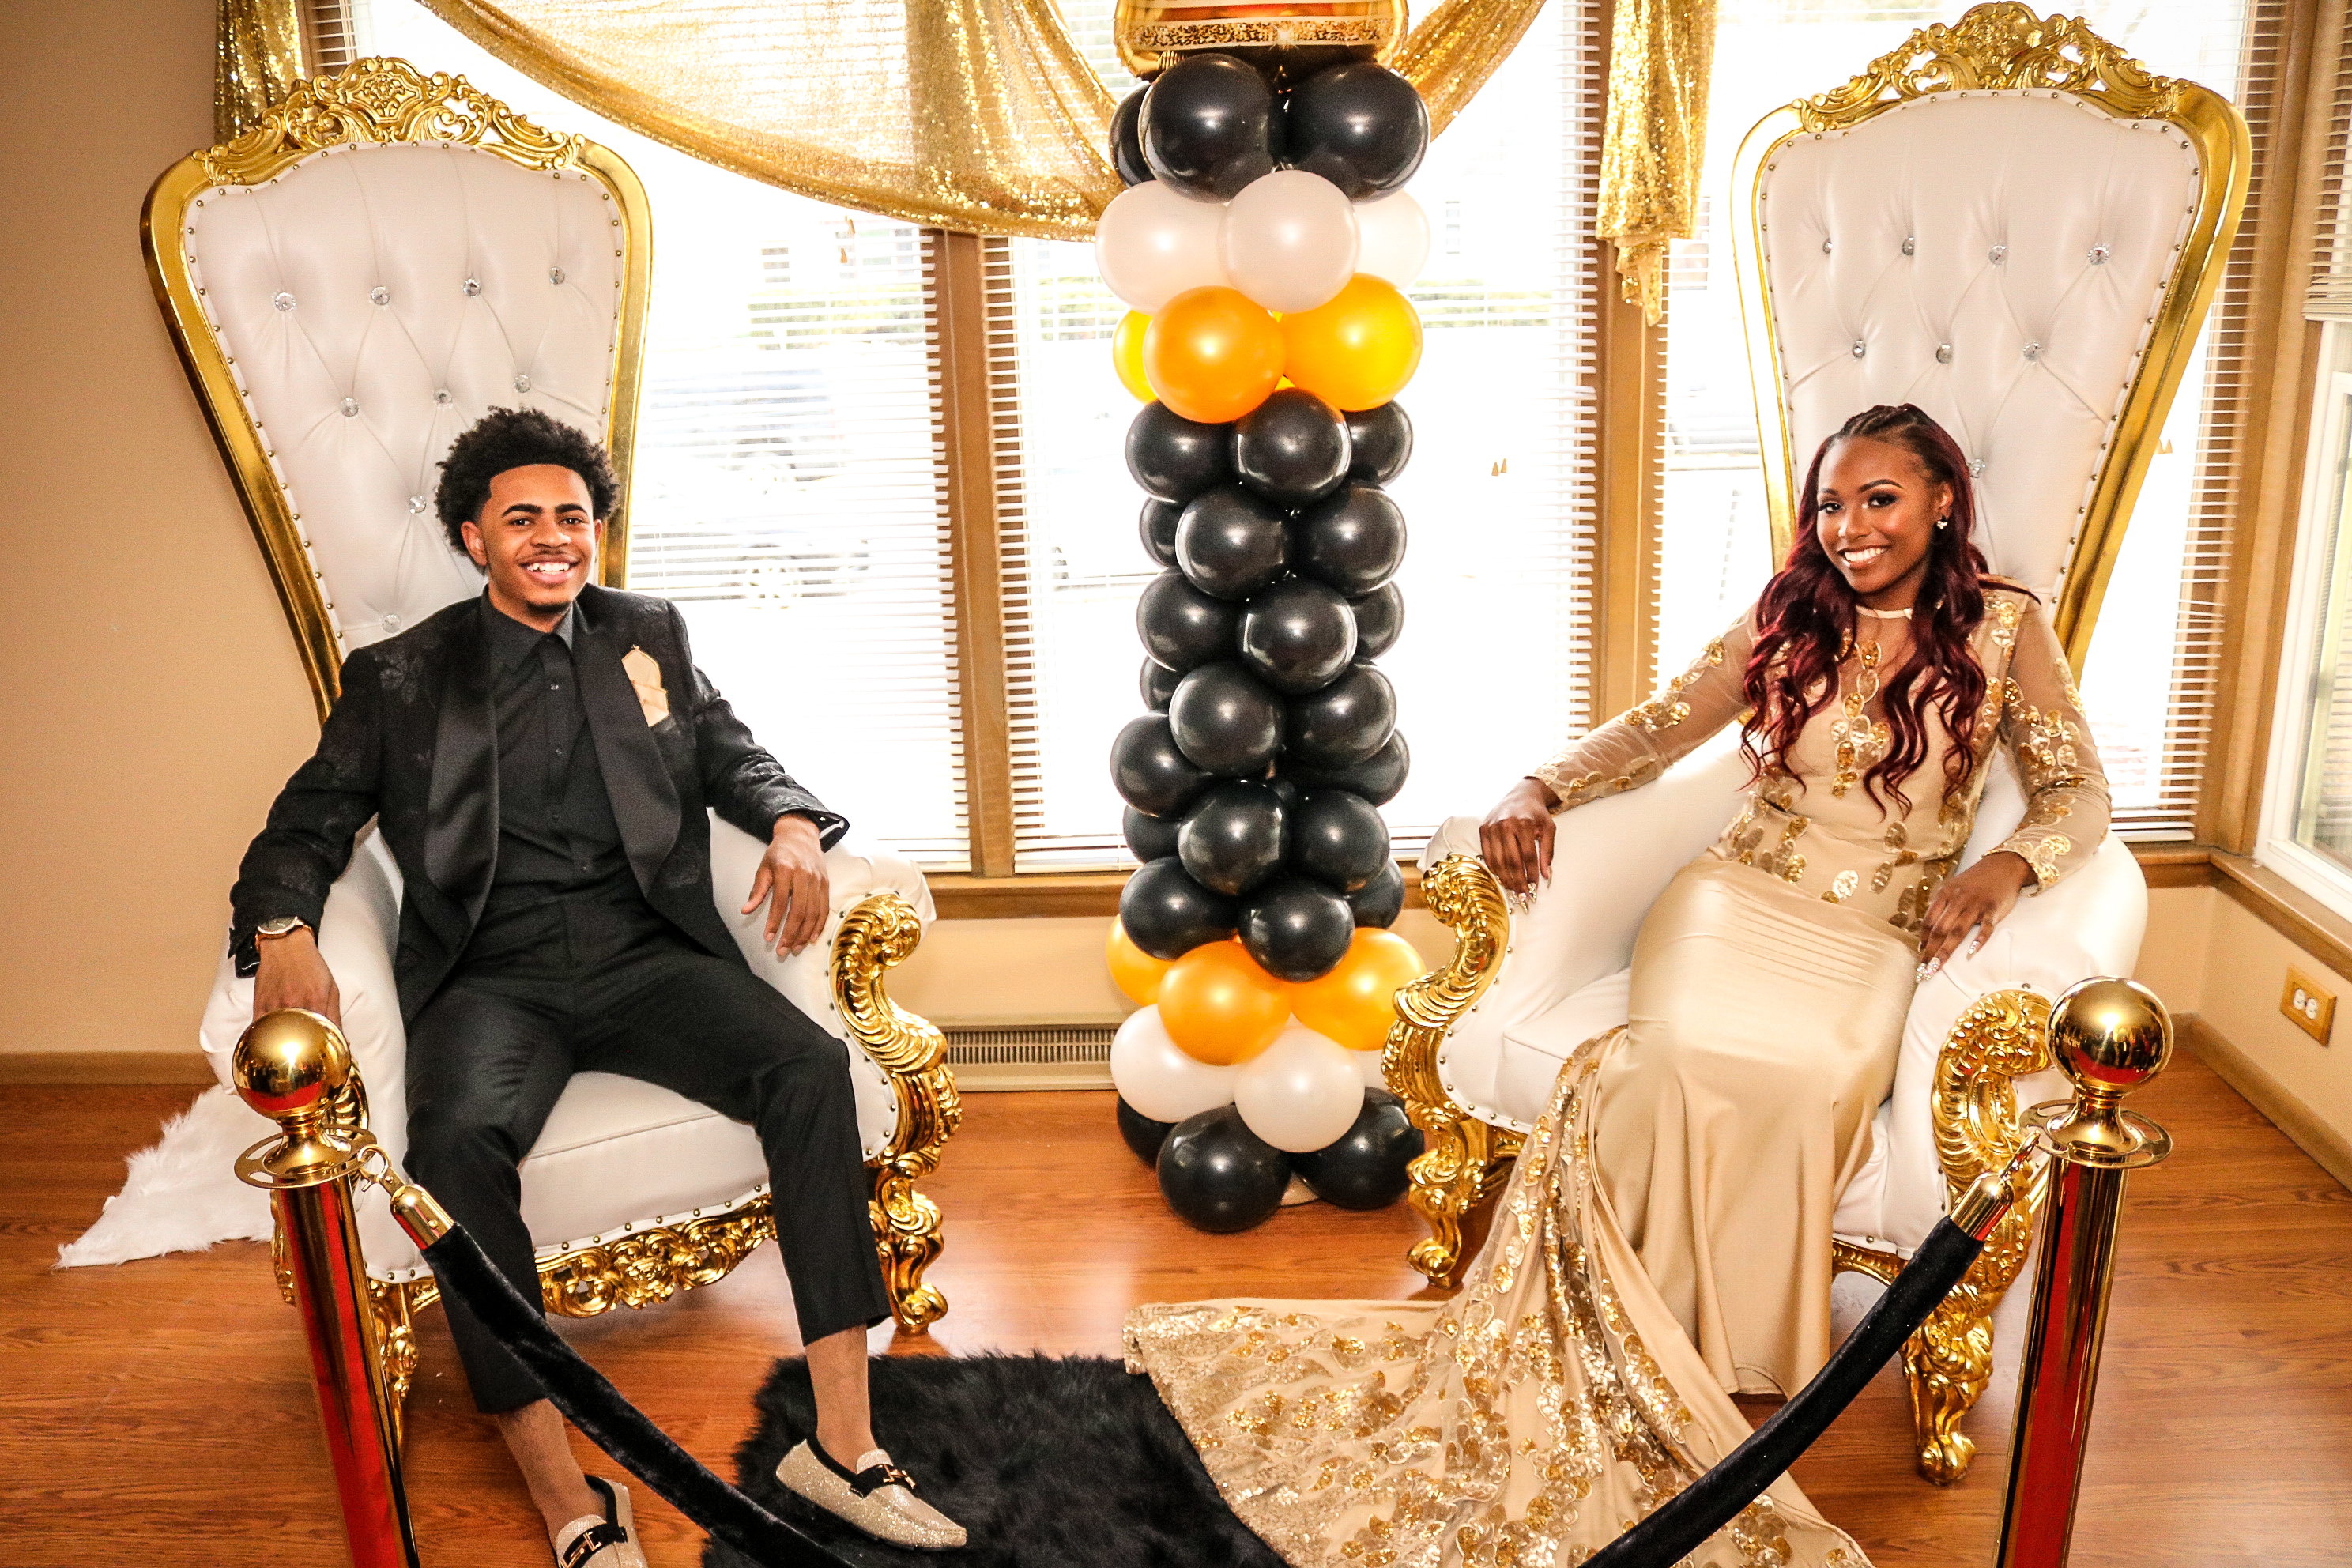 Senior/Prom Photos